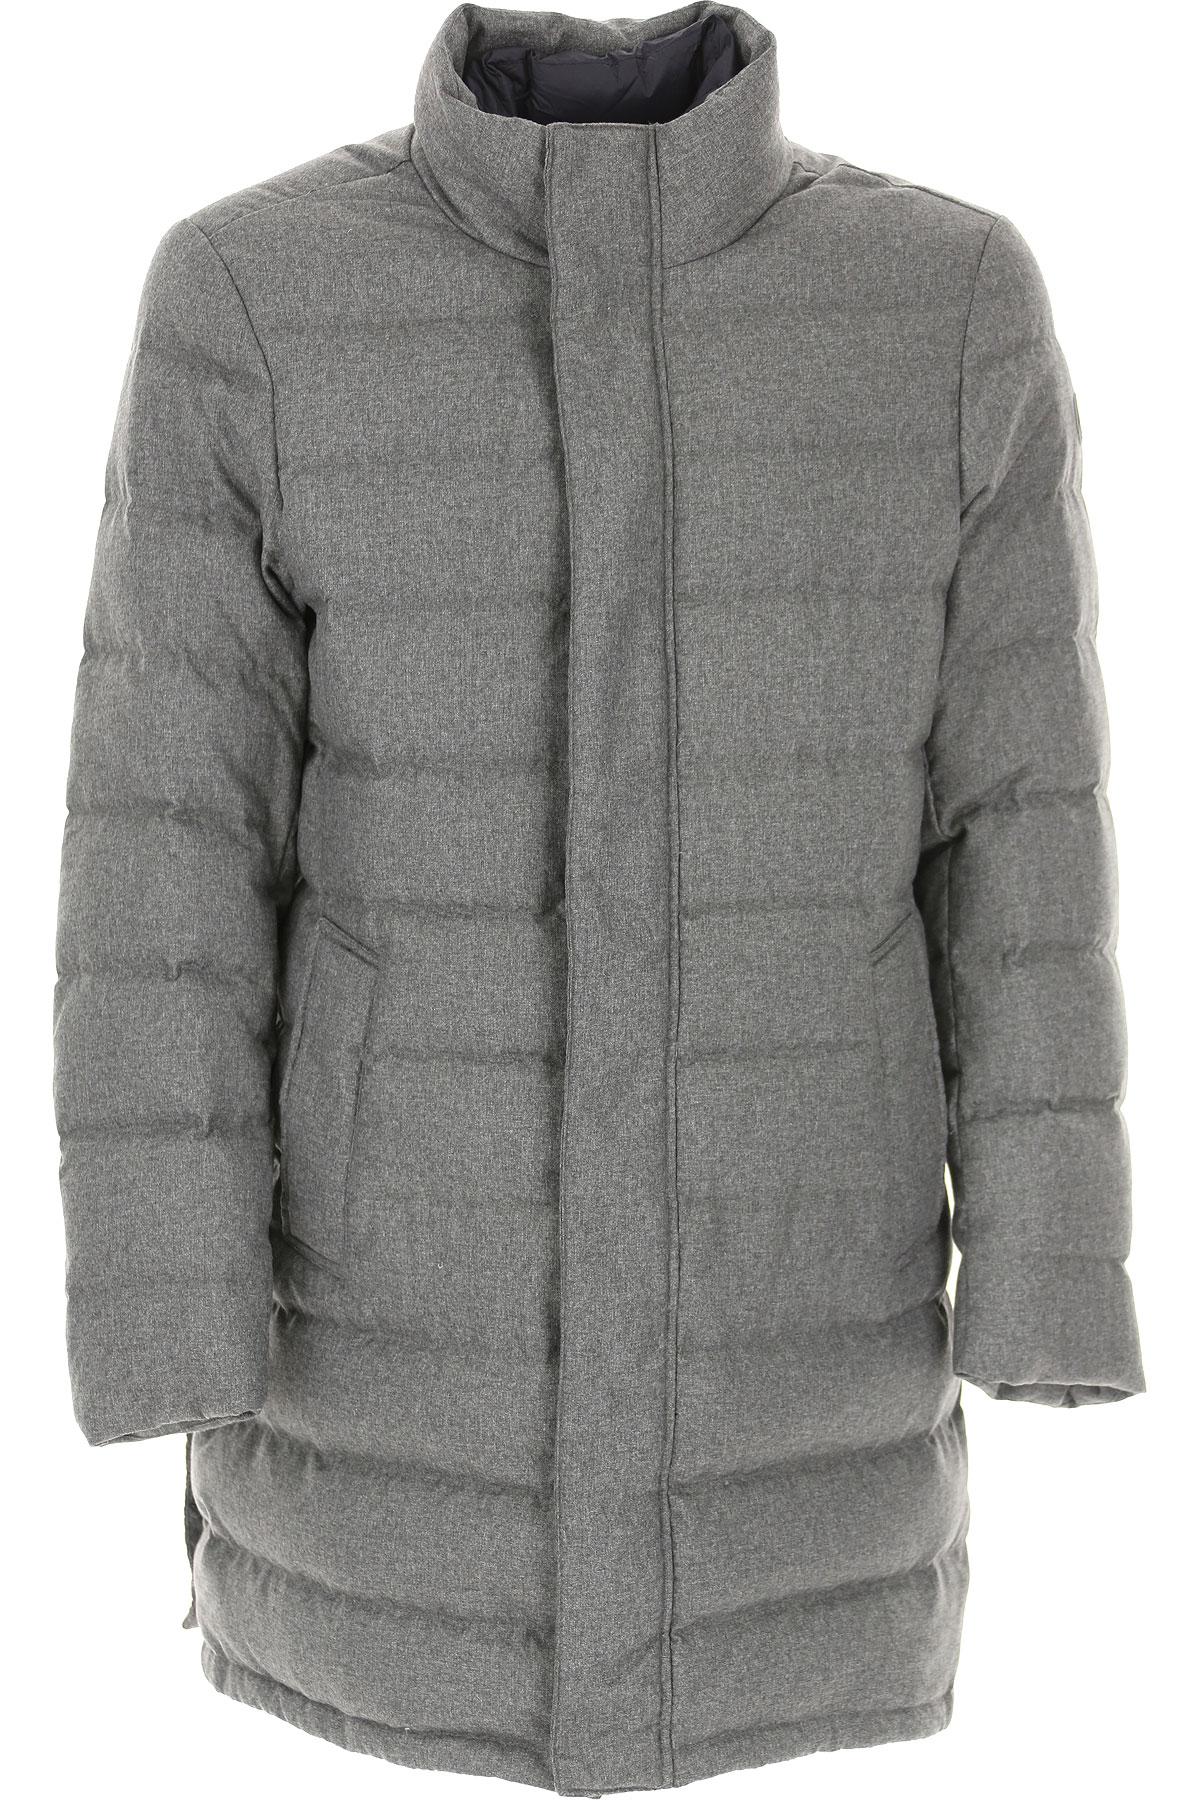 People of Shibuya Down Jacket for Men, Puffer Ski Jacket On Sale, Medium Grey, polyamide, 2019, L M XL XXL